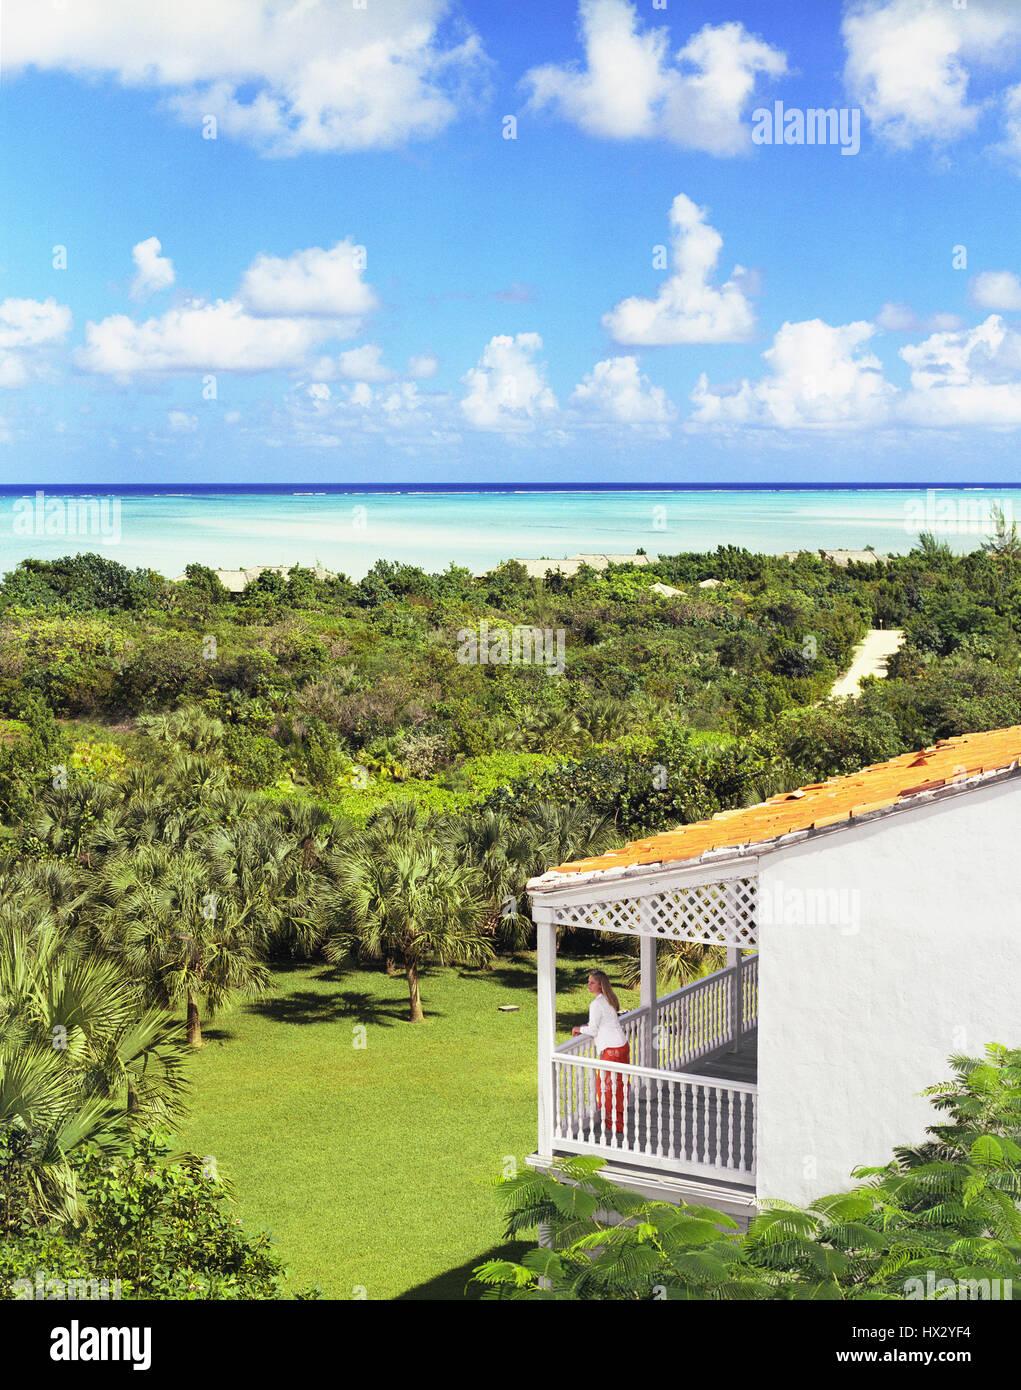 Woman standing on verandah , Turks and Caicos - Stock Image